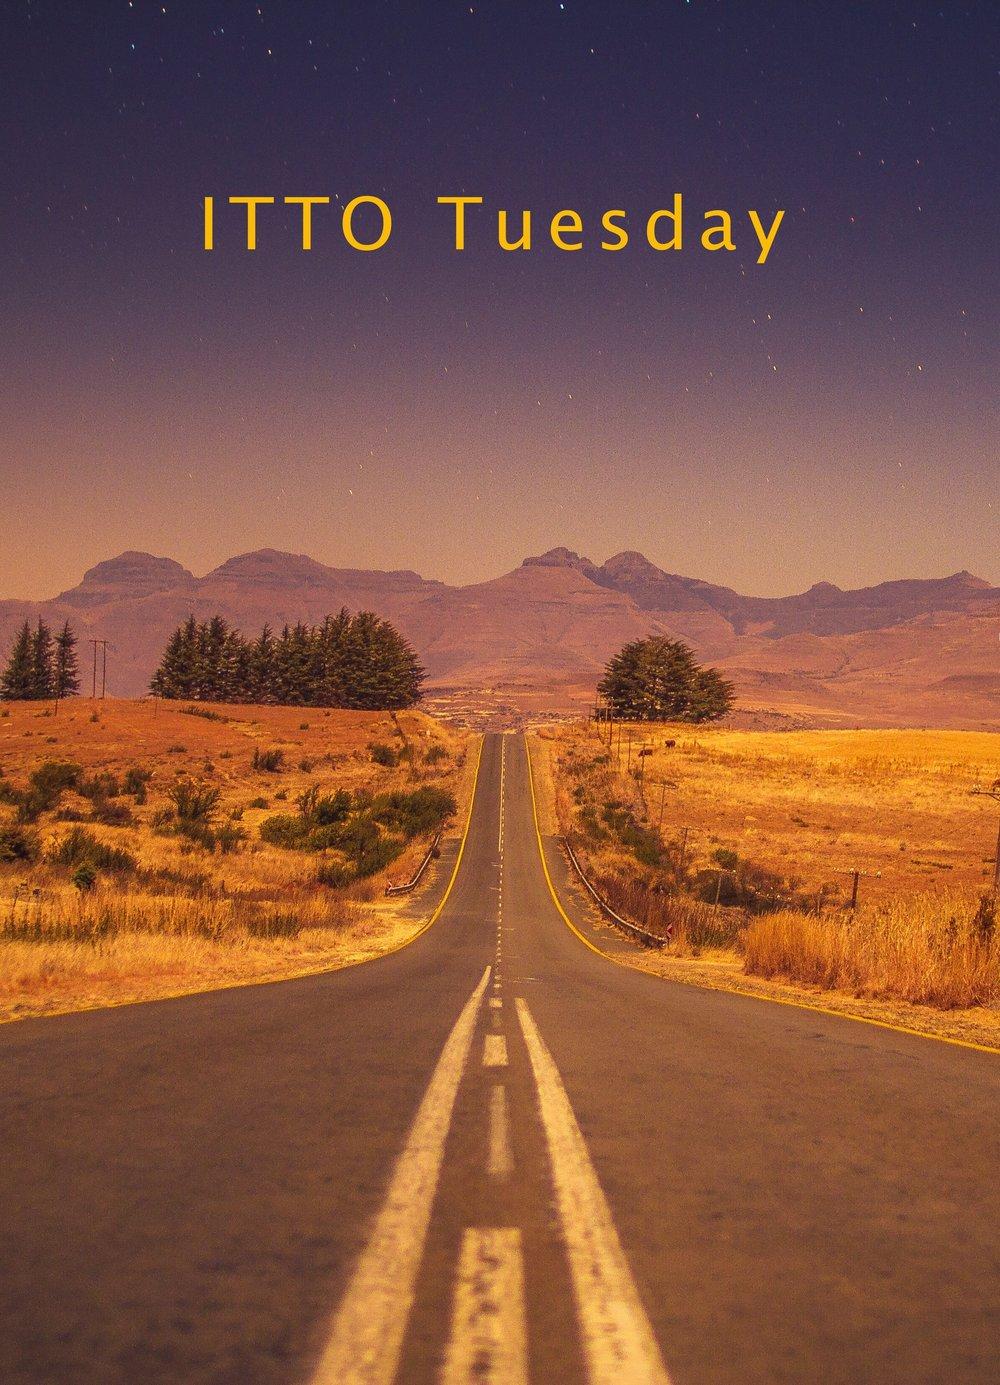 ITTO Tuesday.jpg